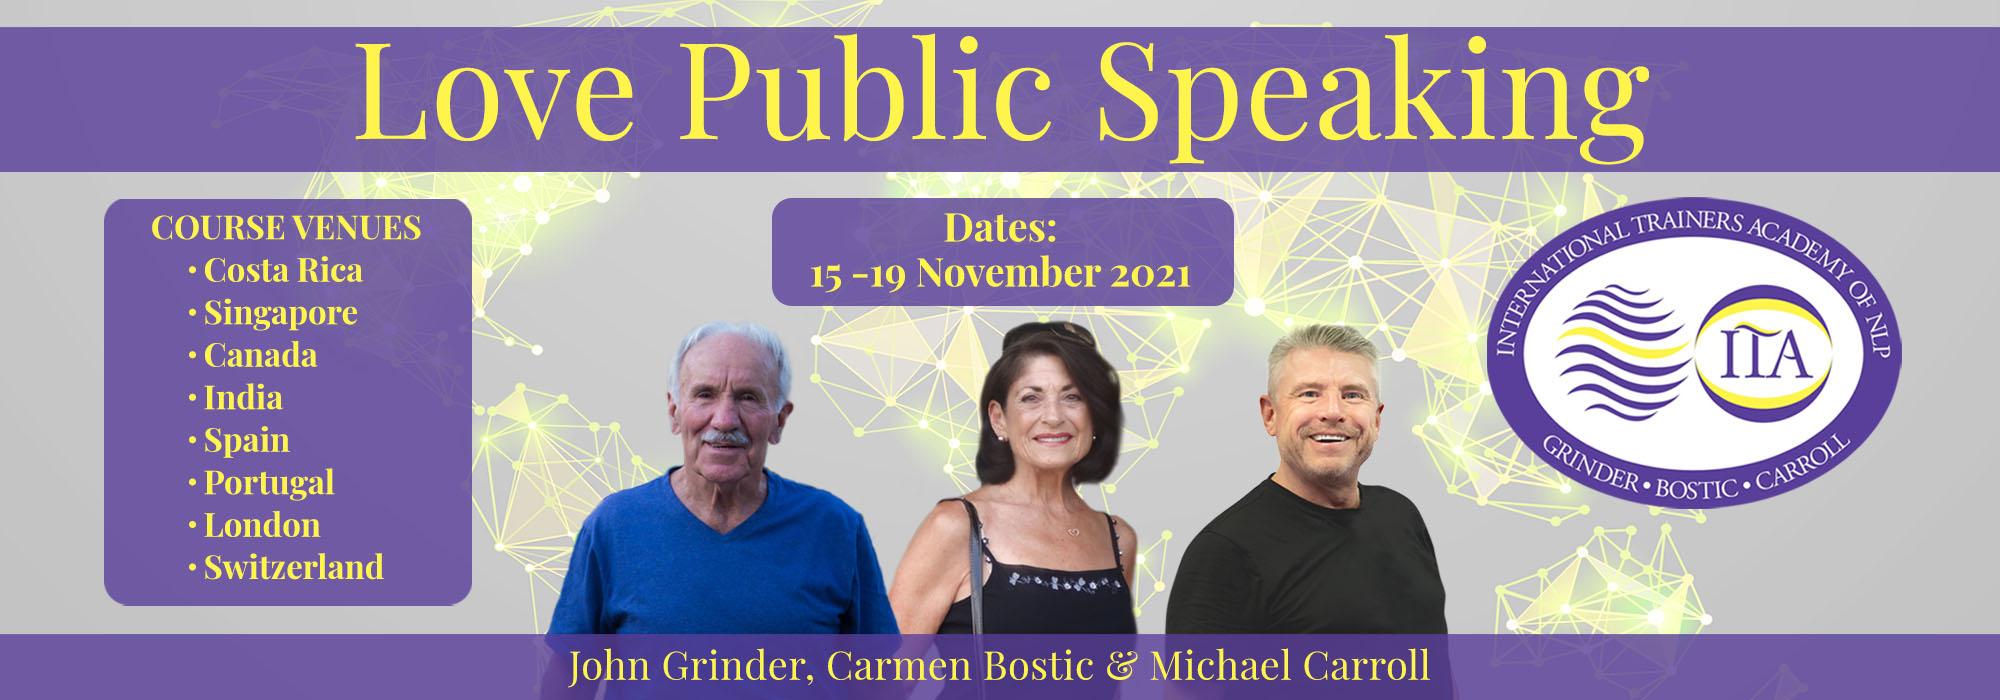 Love Public Speaking Globally